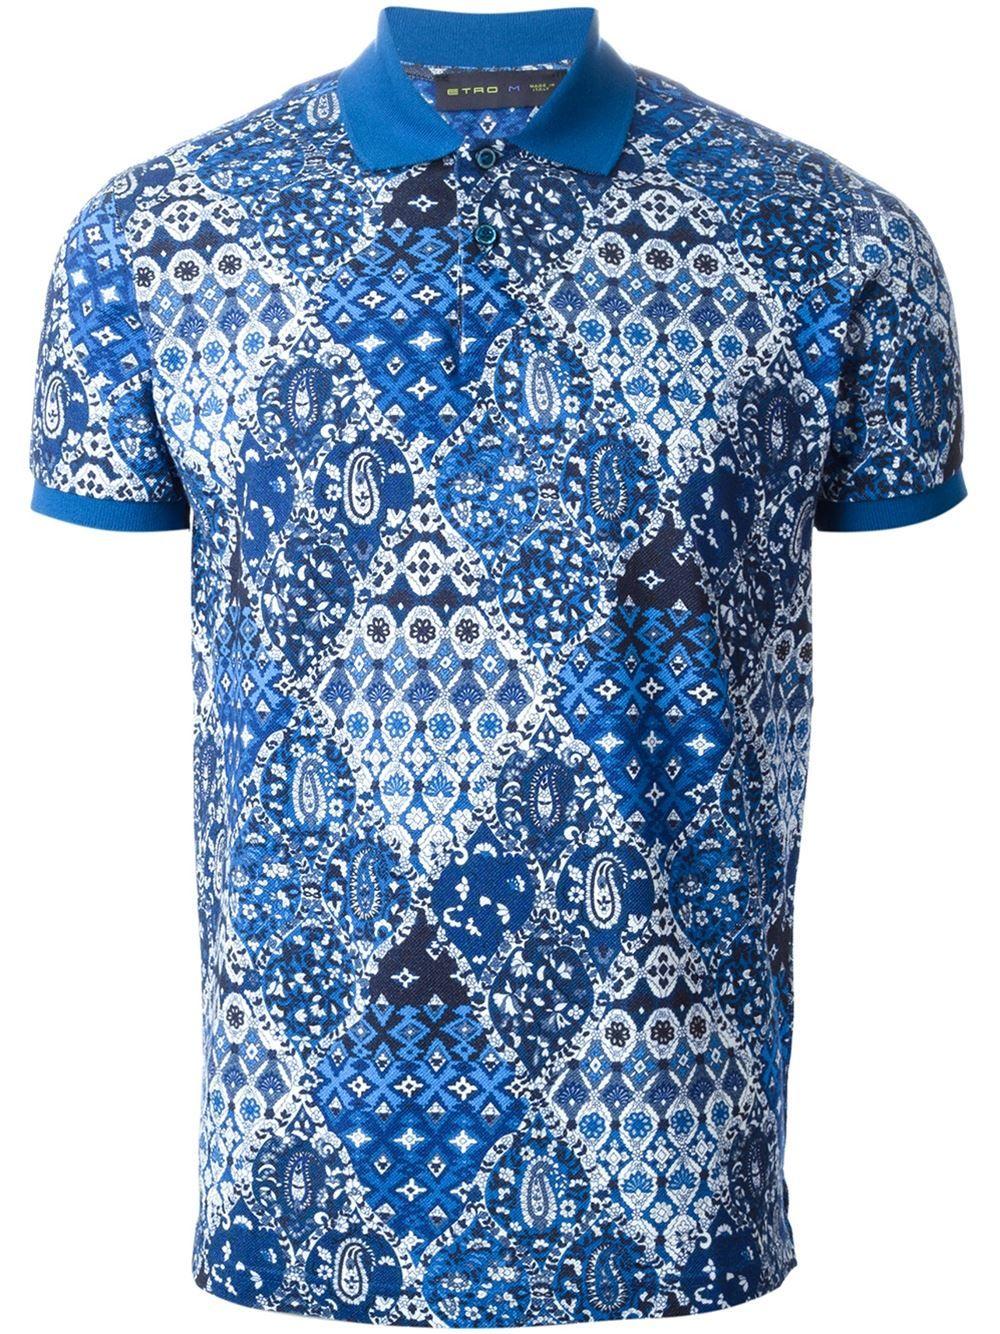 8920030c Etro Paisley Print Polo Shirt - Gore - Farfetch.com | naval ...